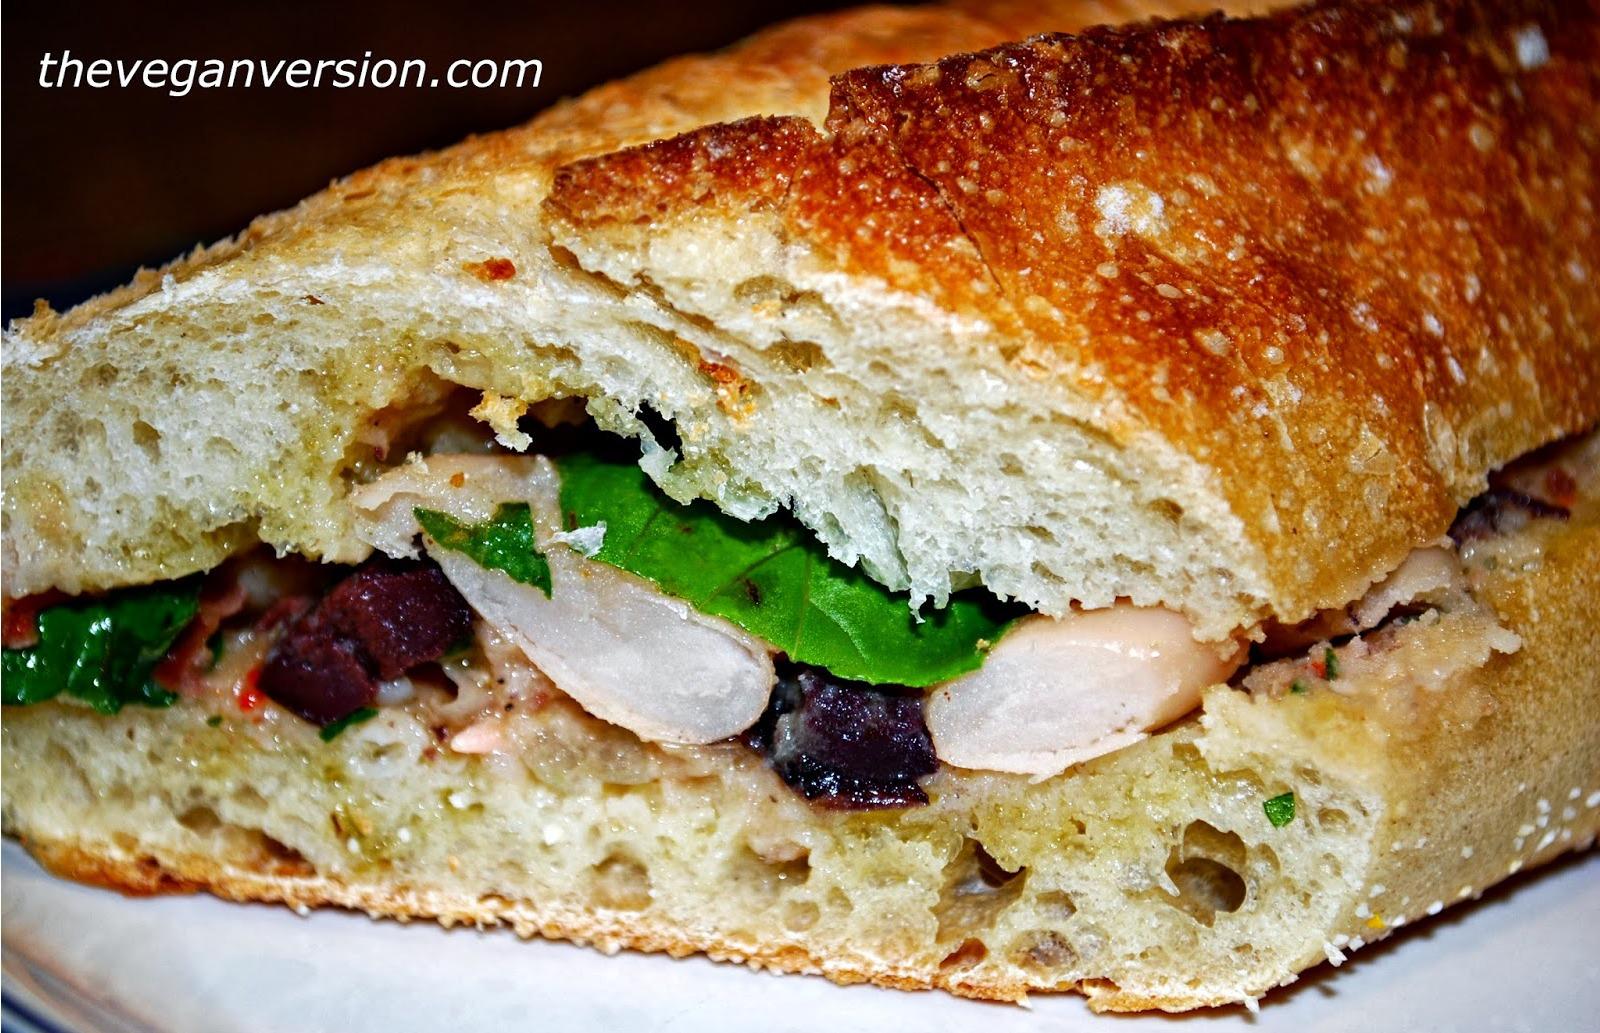 Vegan Chickpea Tuna Melt Sandwich